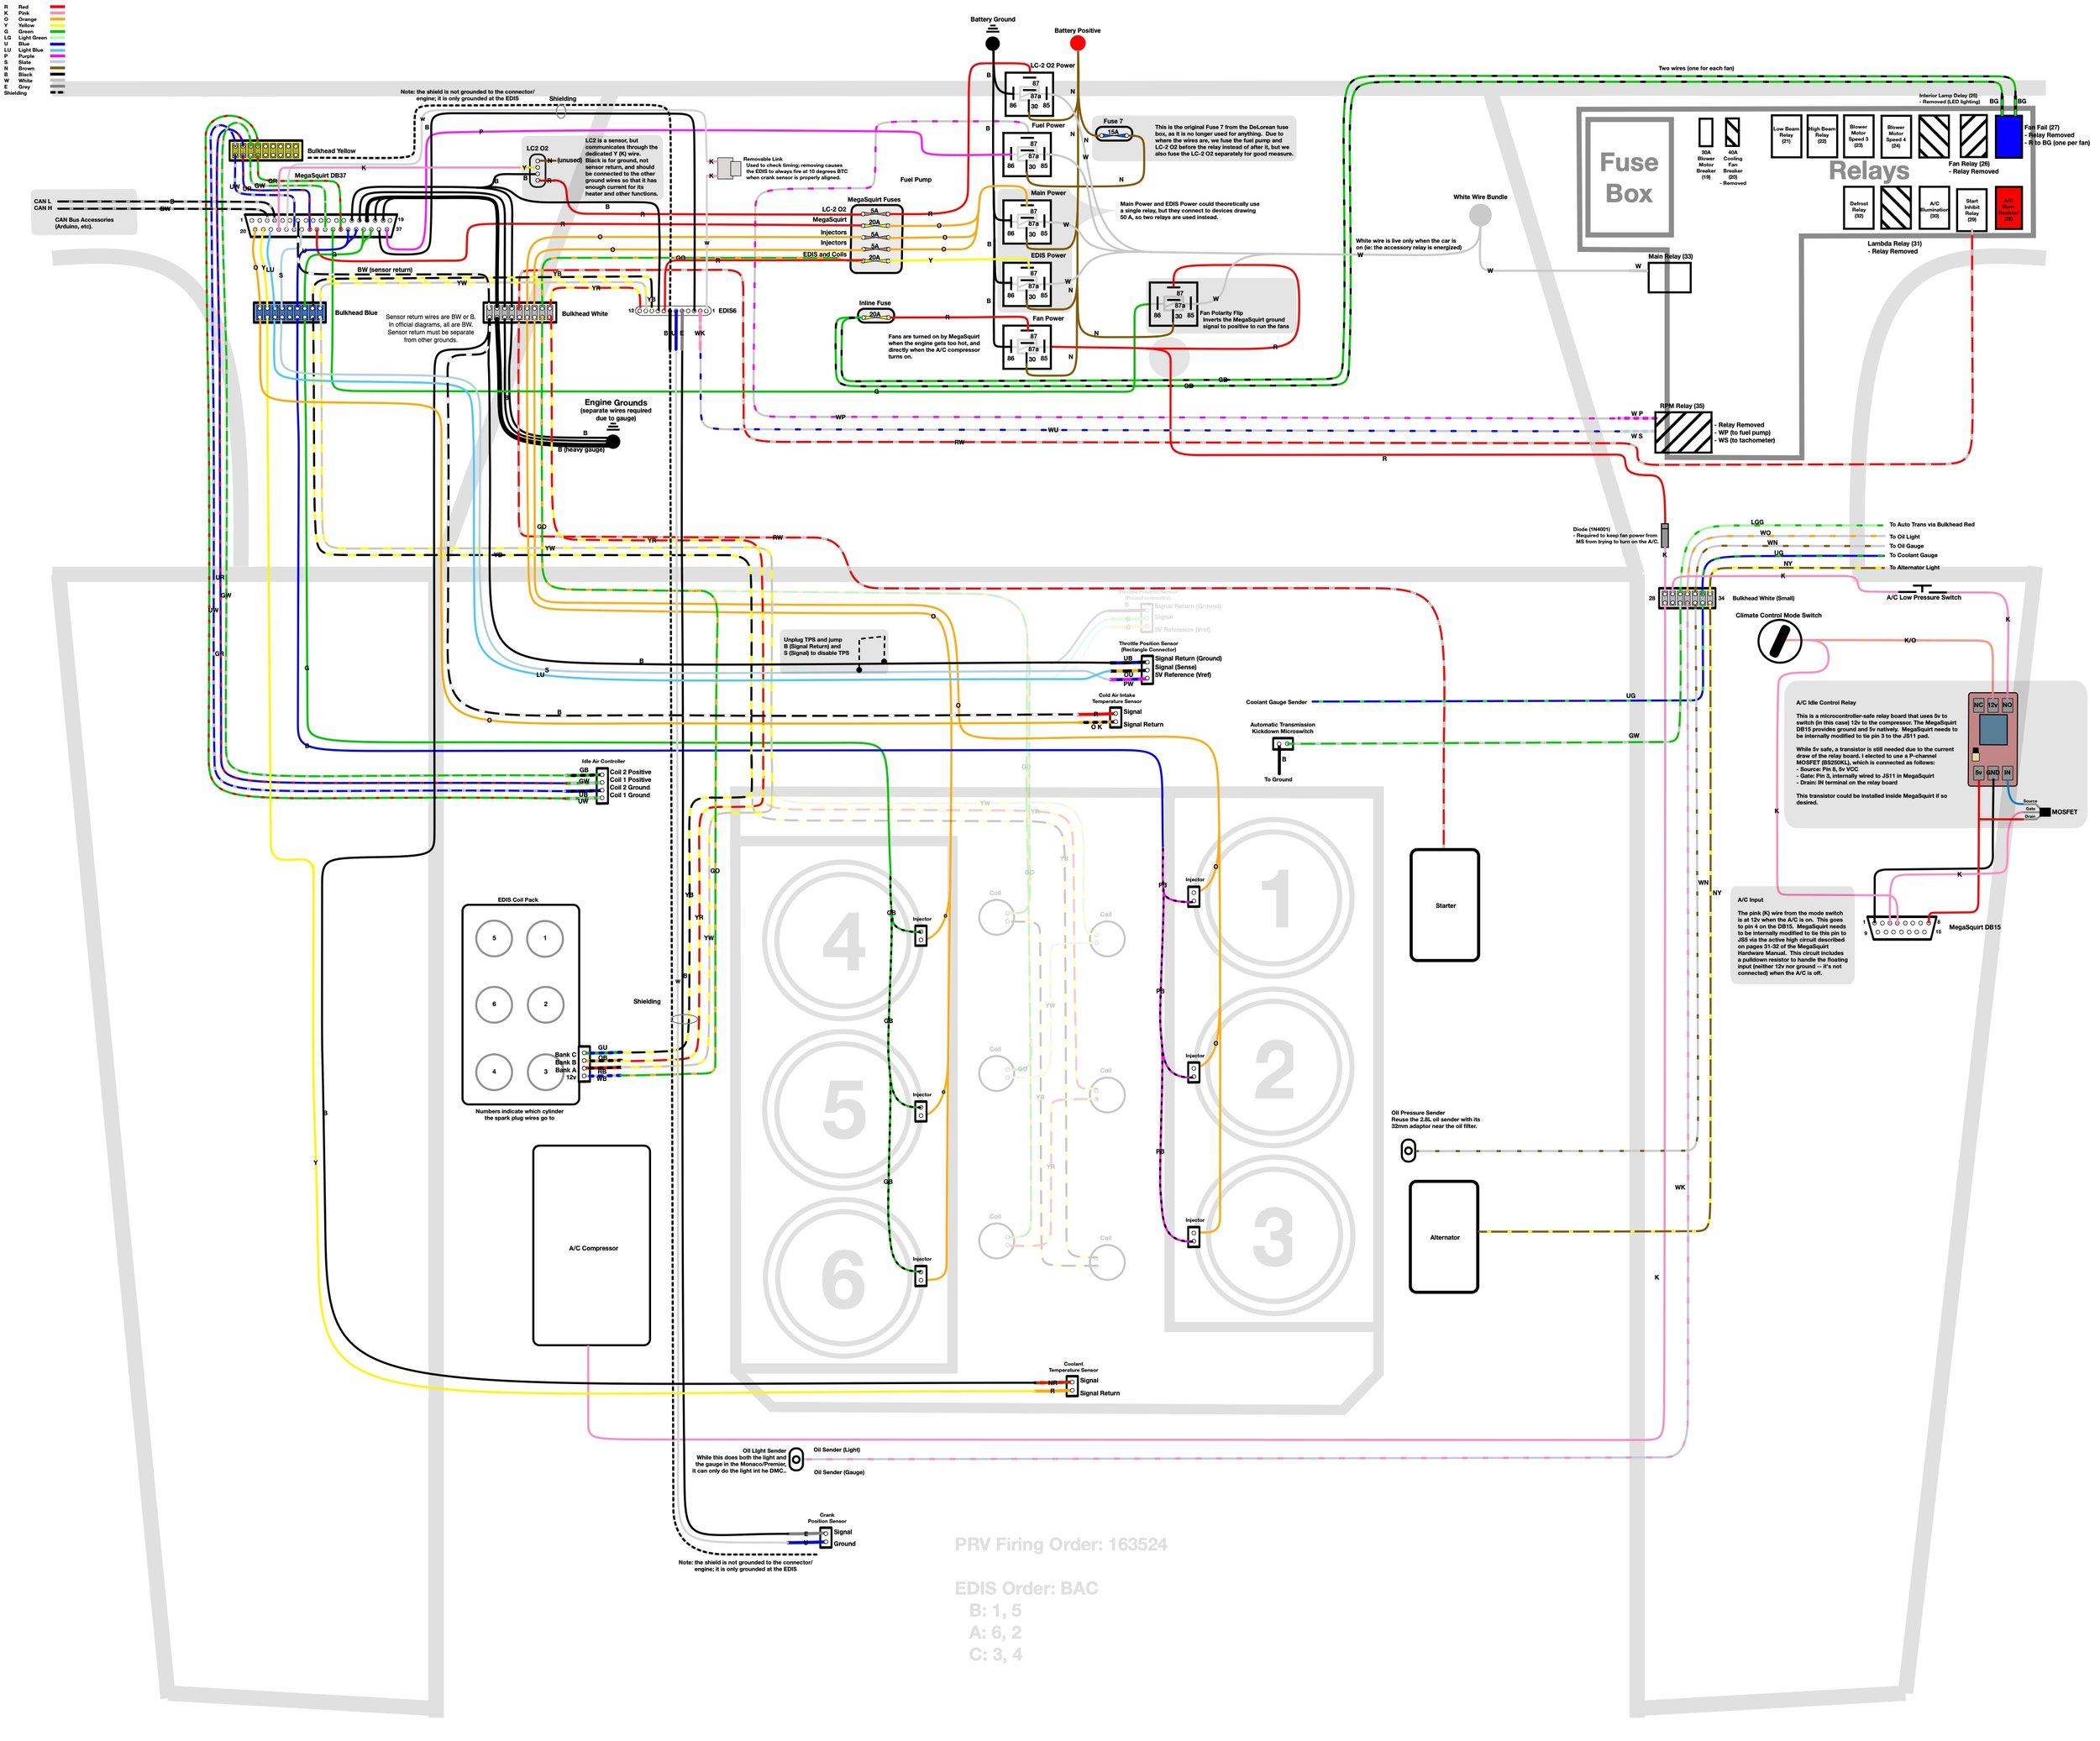 delorean engine diagram automotive wiring diagram library u2022 rh seigokanengland co uk delorean fuse box diagram